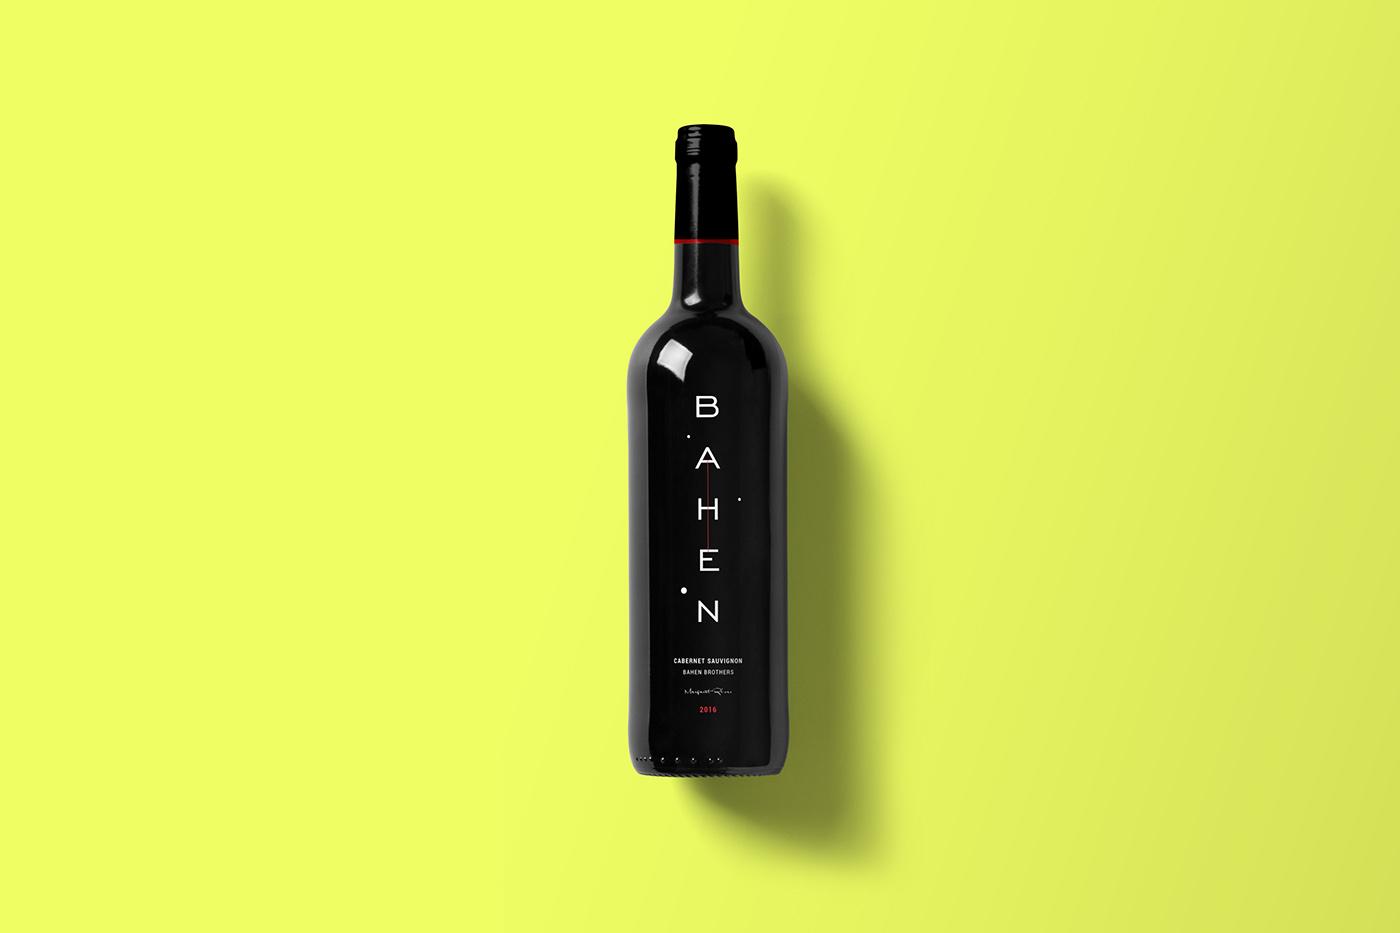 Packaging,design,concept,wine,Label,colors,minimalistic,exploration,branding ,cabernet